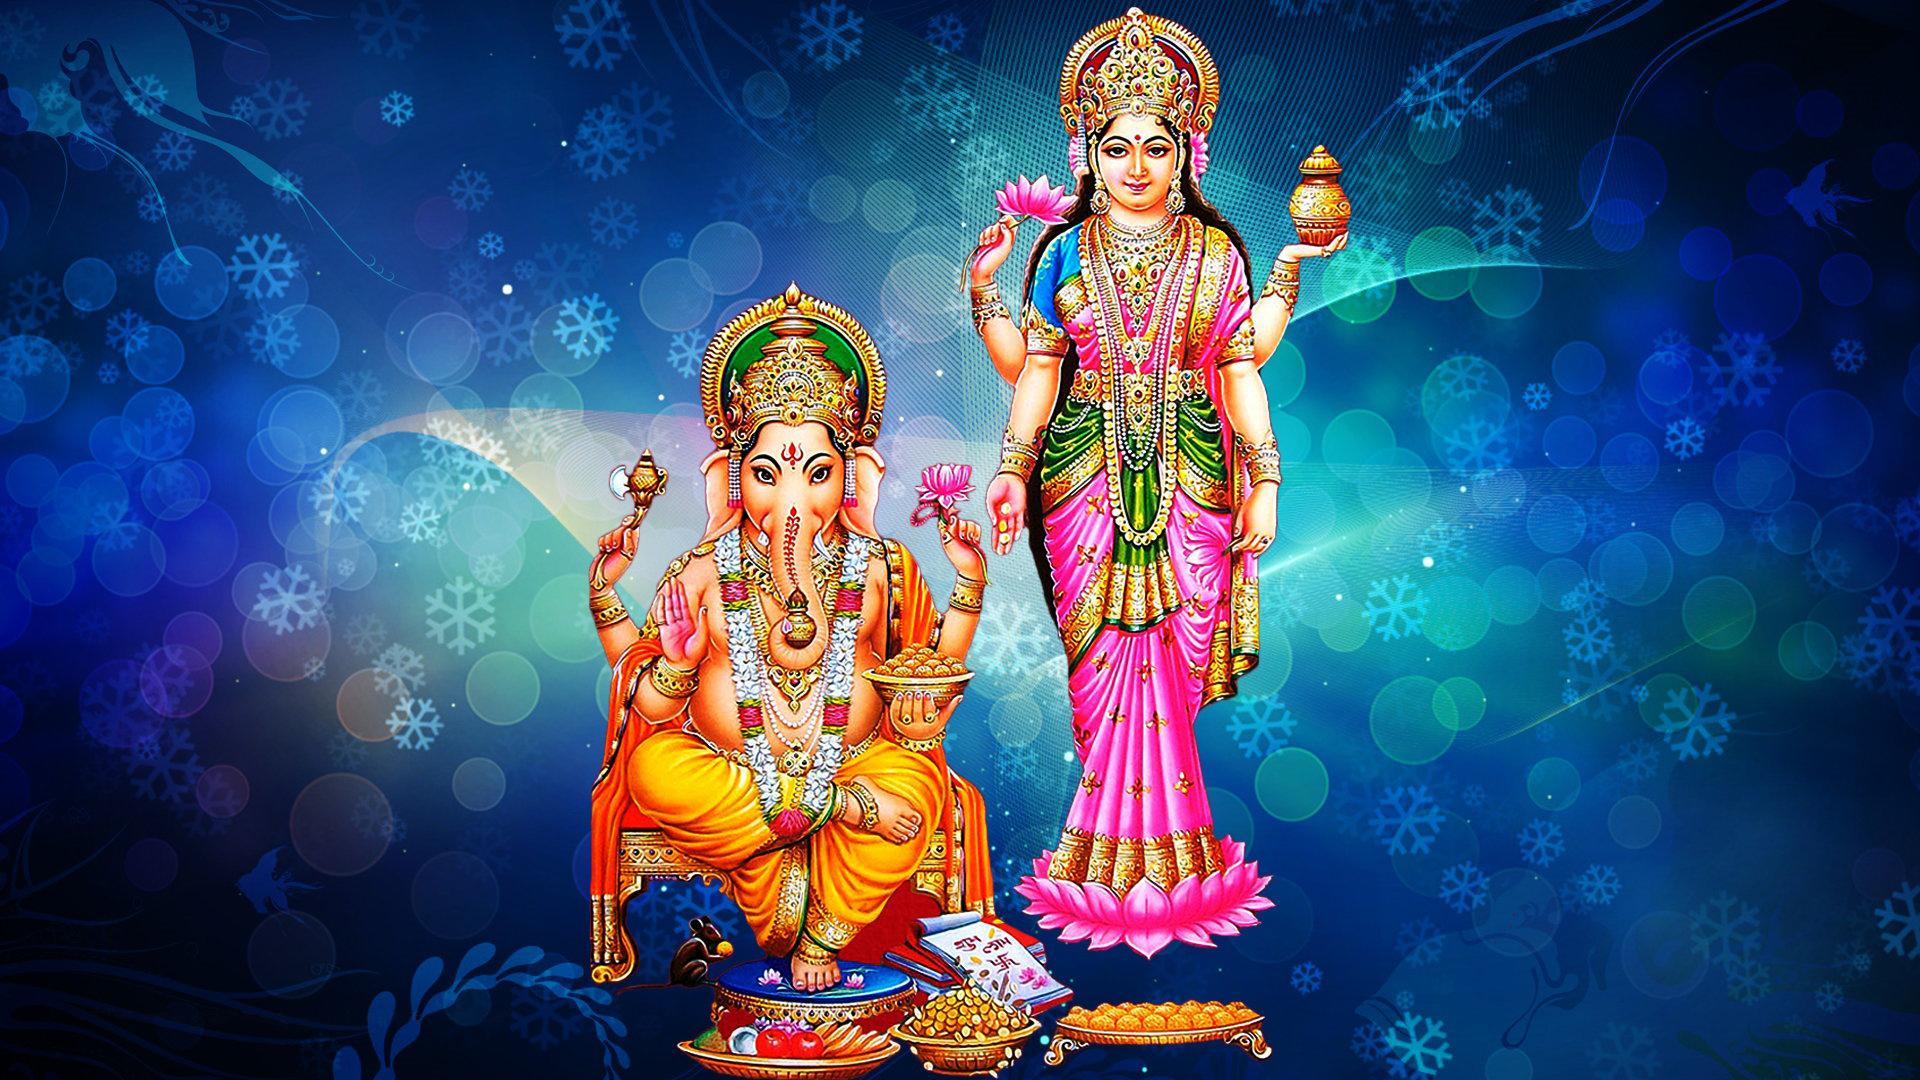 Mata Rani Wallpaper 3d Goddess Laxmi And Lord Ganesh Blue Decorative Background